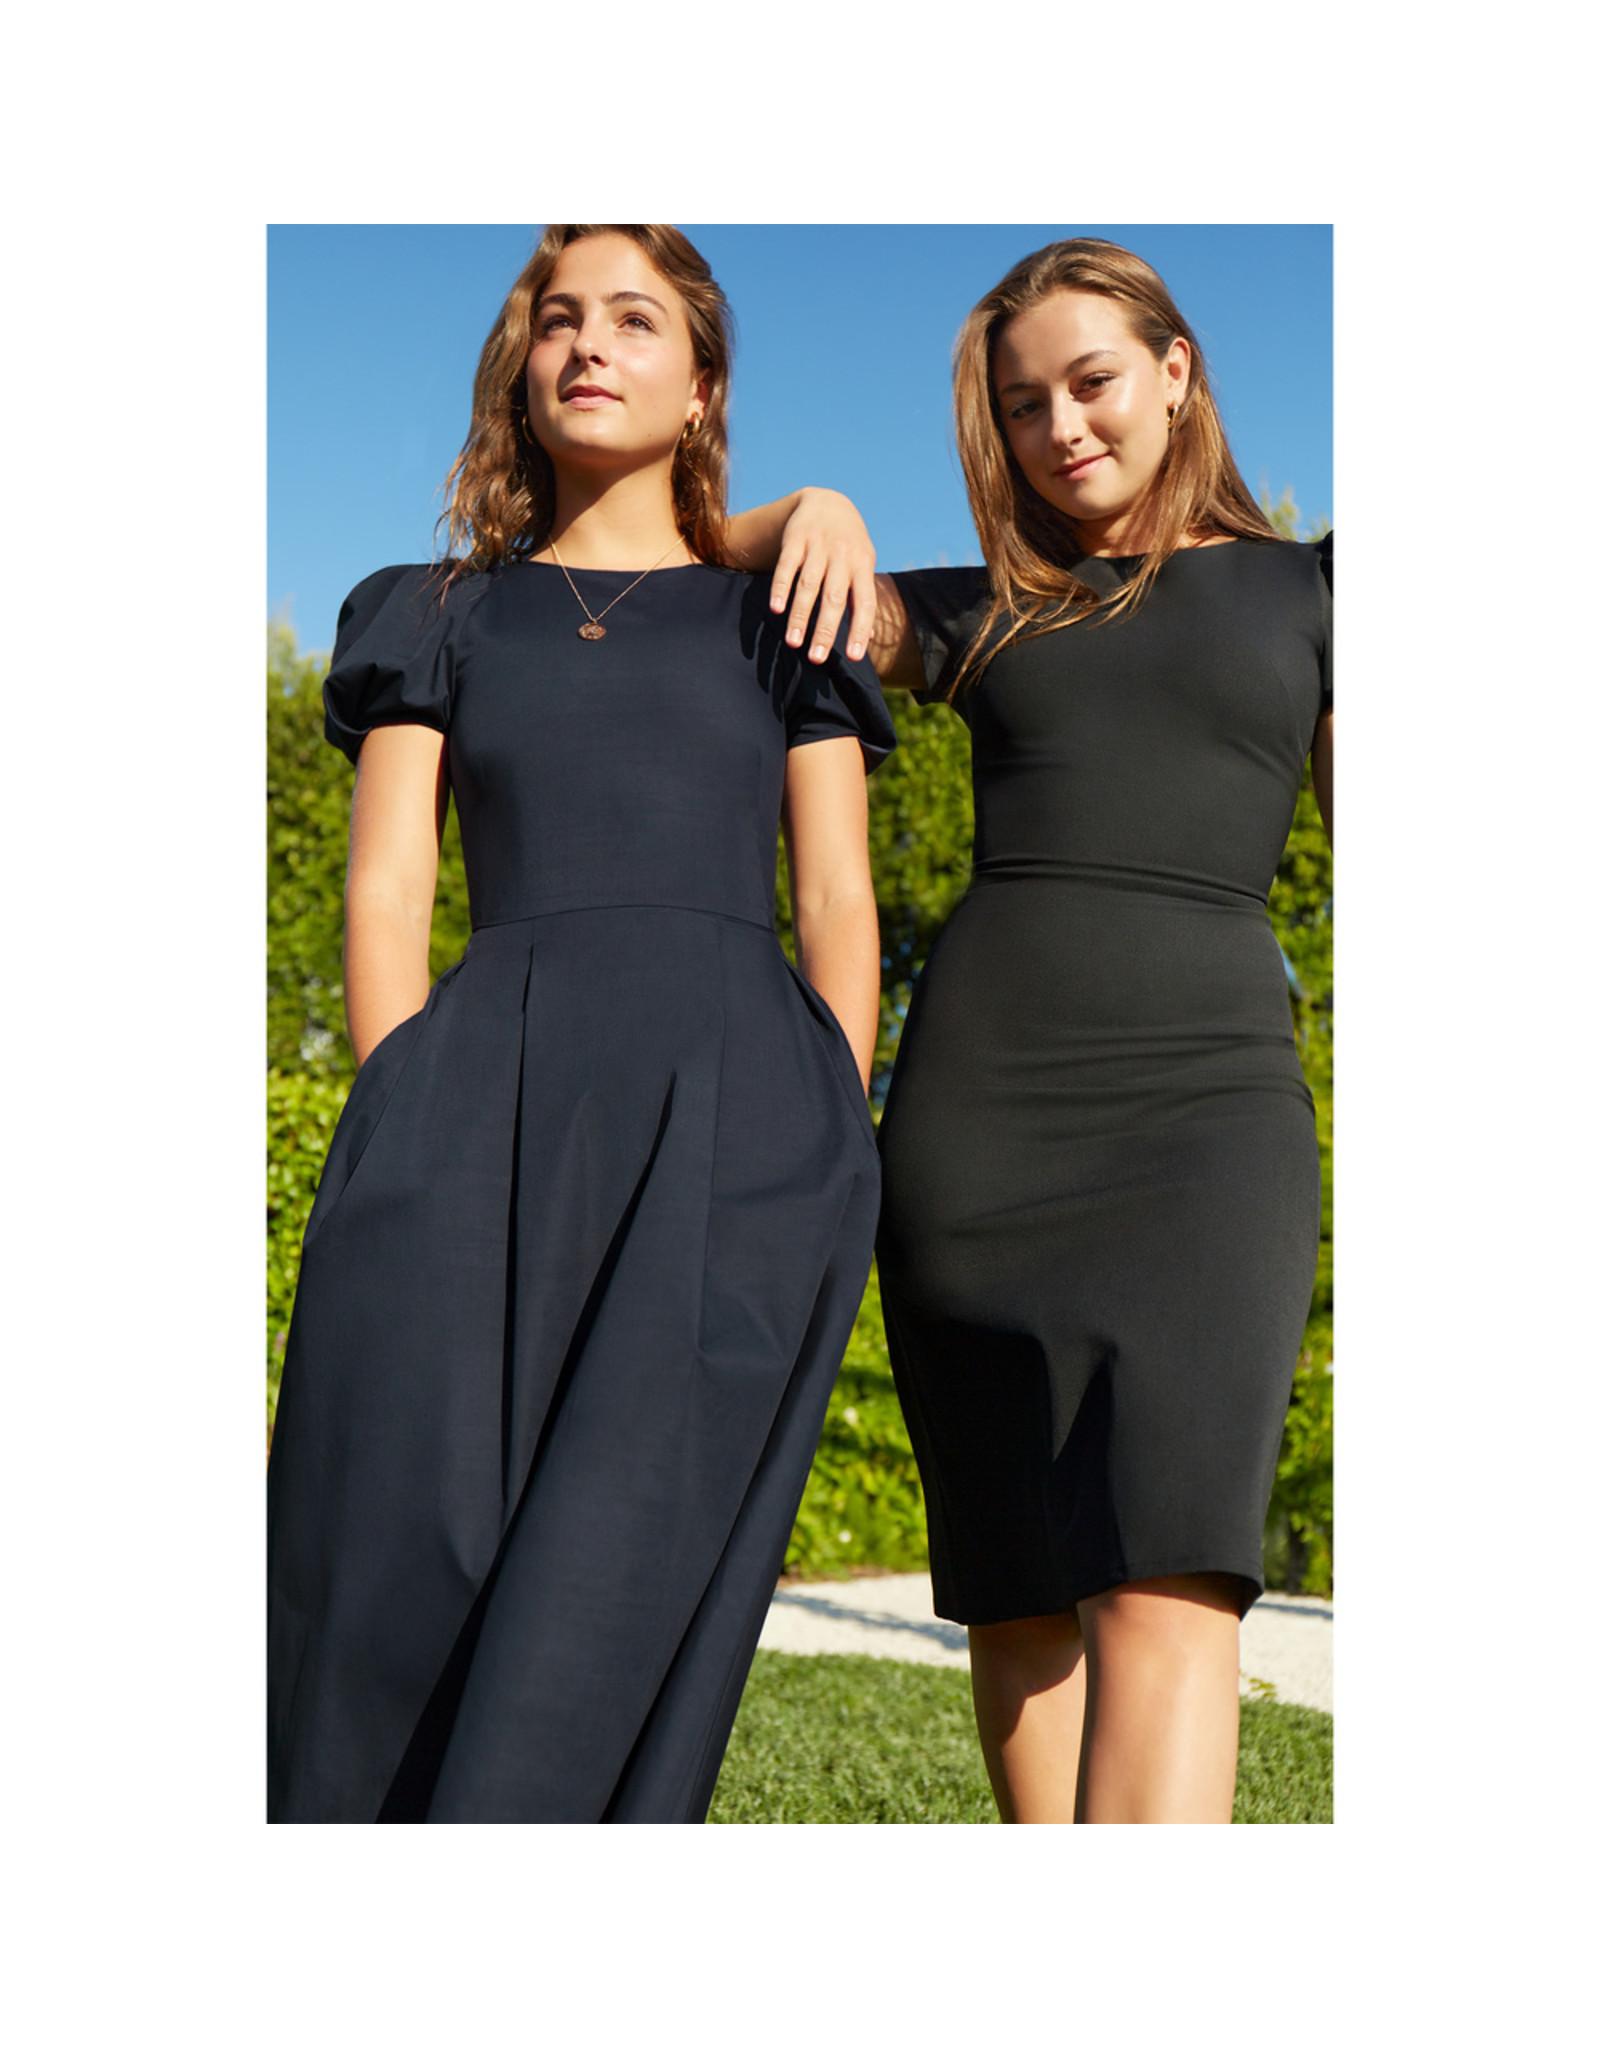 G. Label Ficchi Puff Sleeve Keyhole Back Dress (Color: Black, Size: 6)